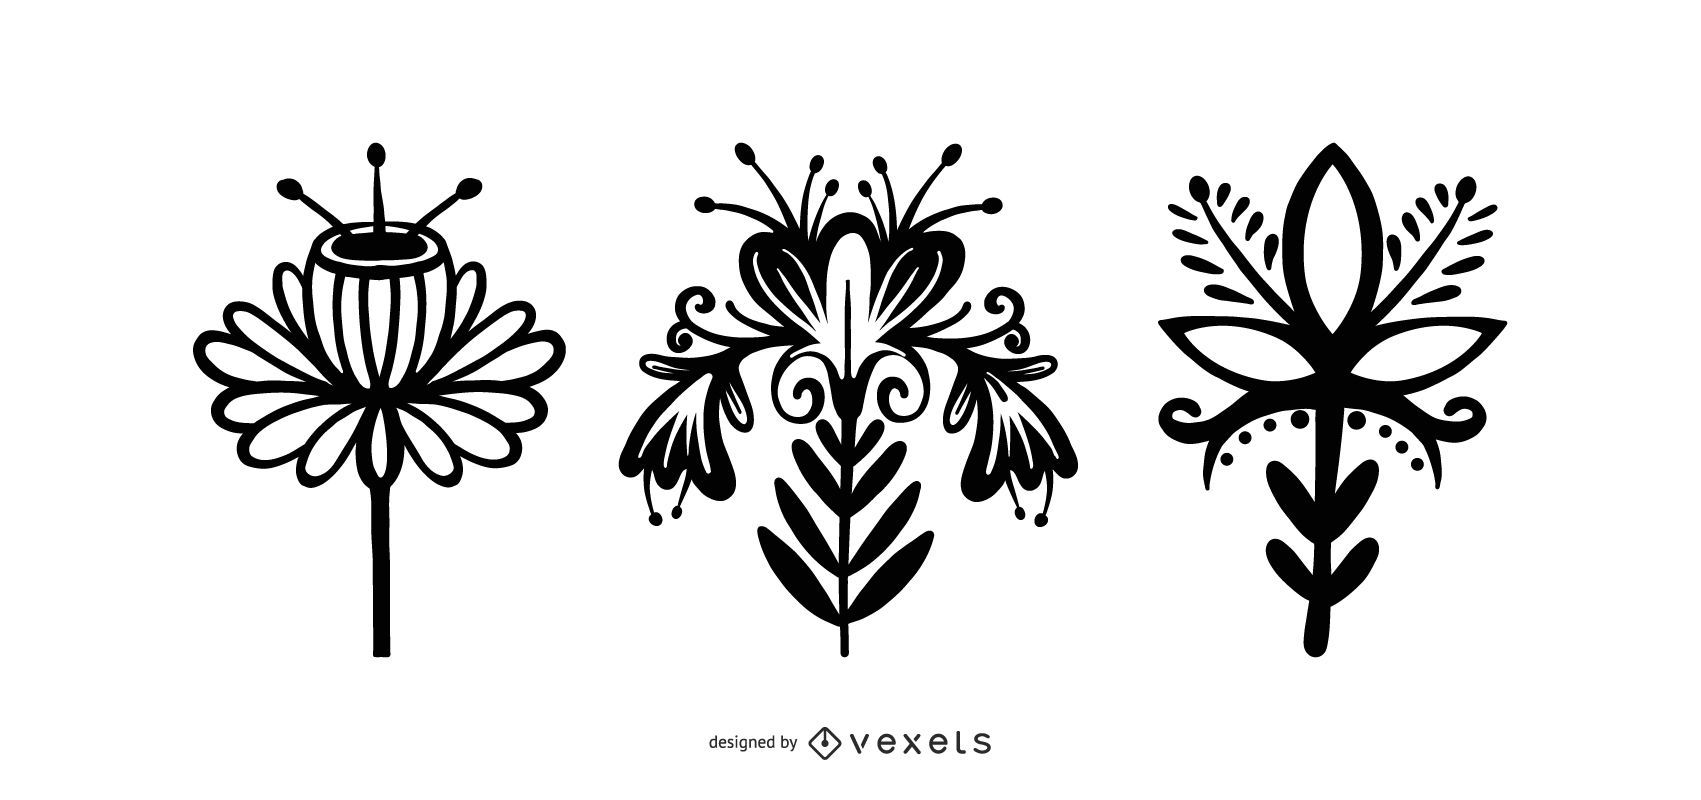 Scandinavian Style Flower Pack